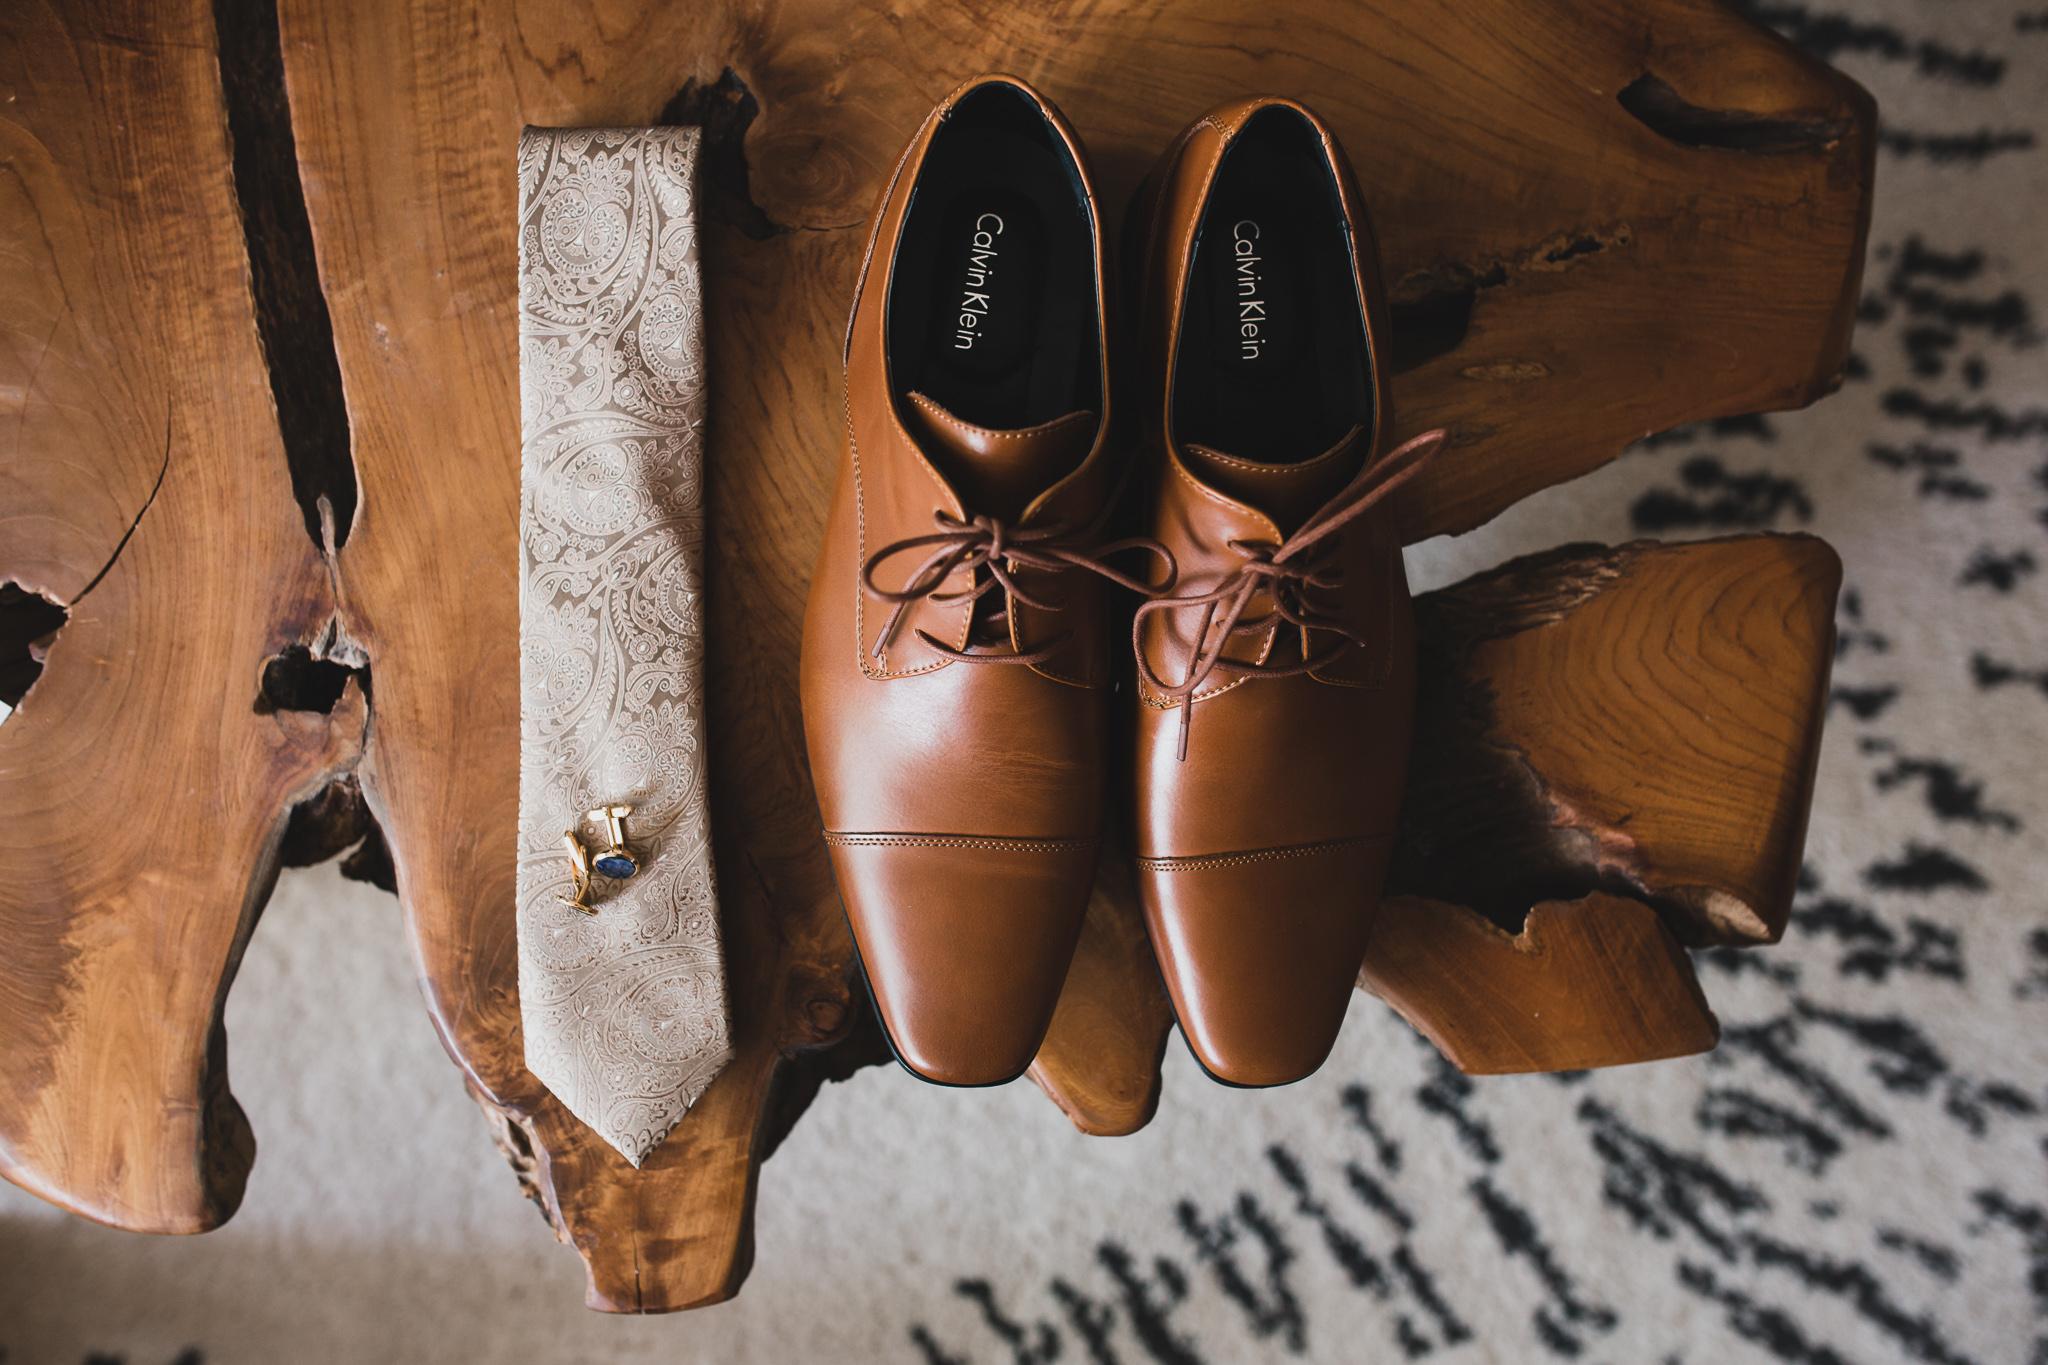 Groom's wedding details, artistic, teak